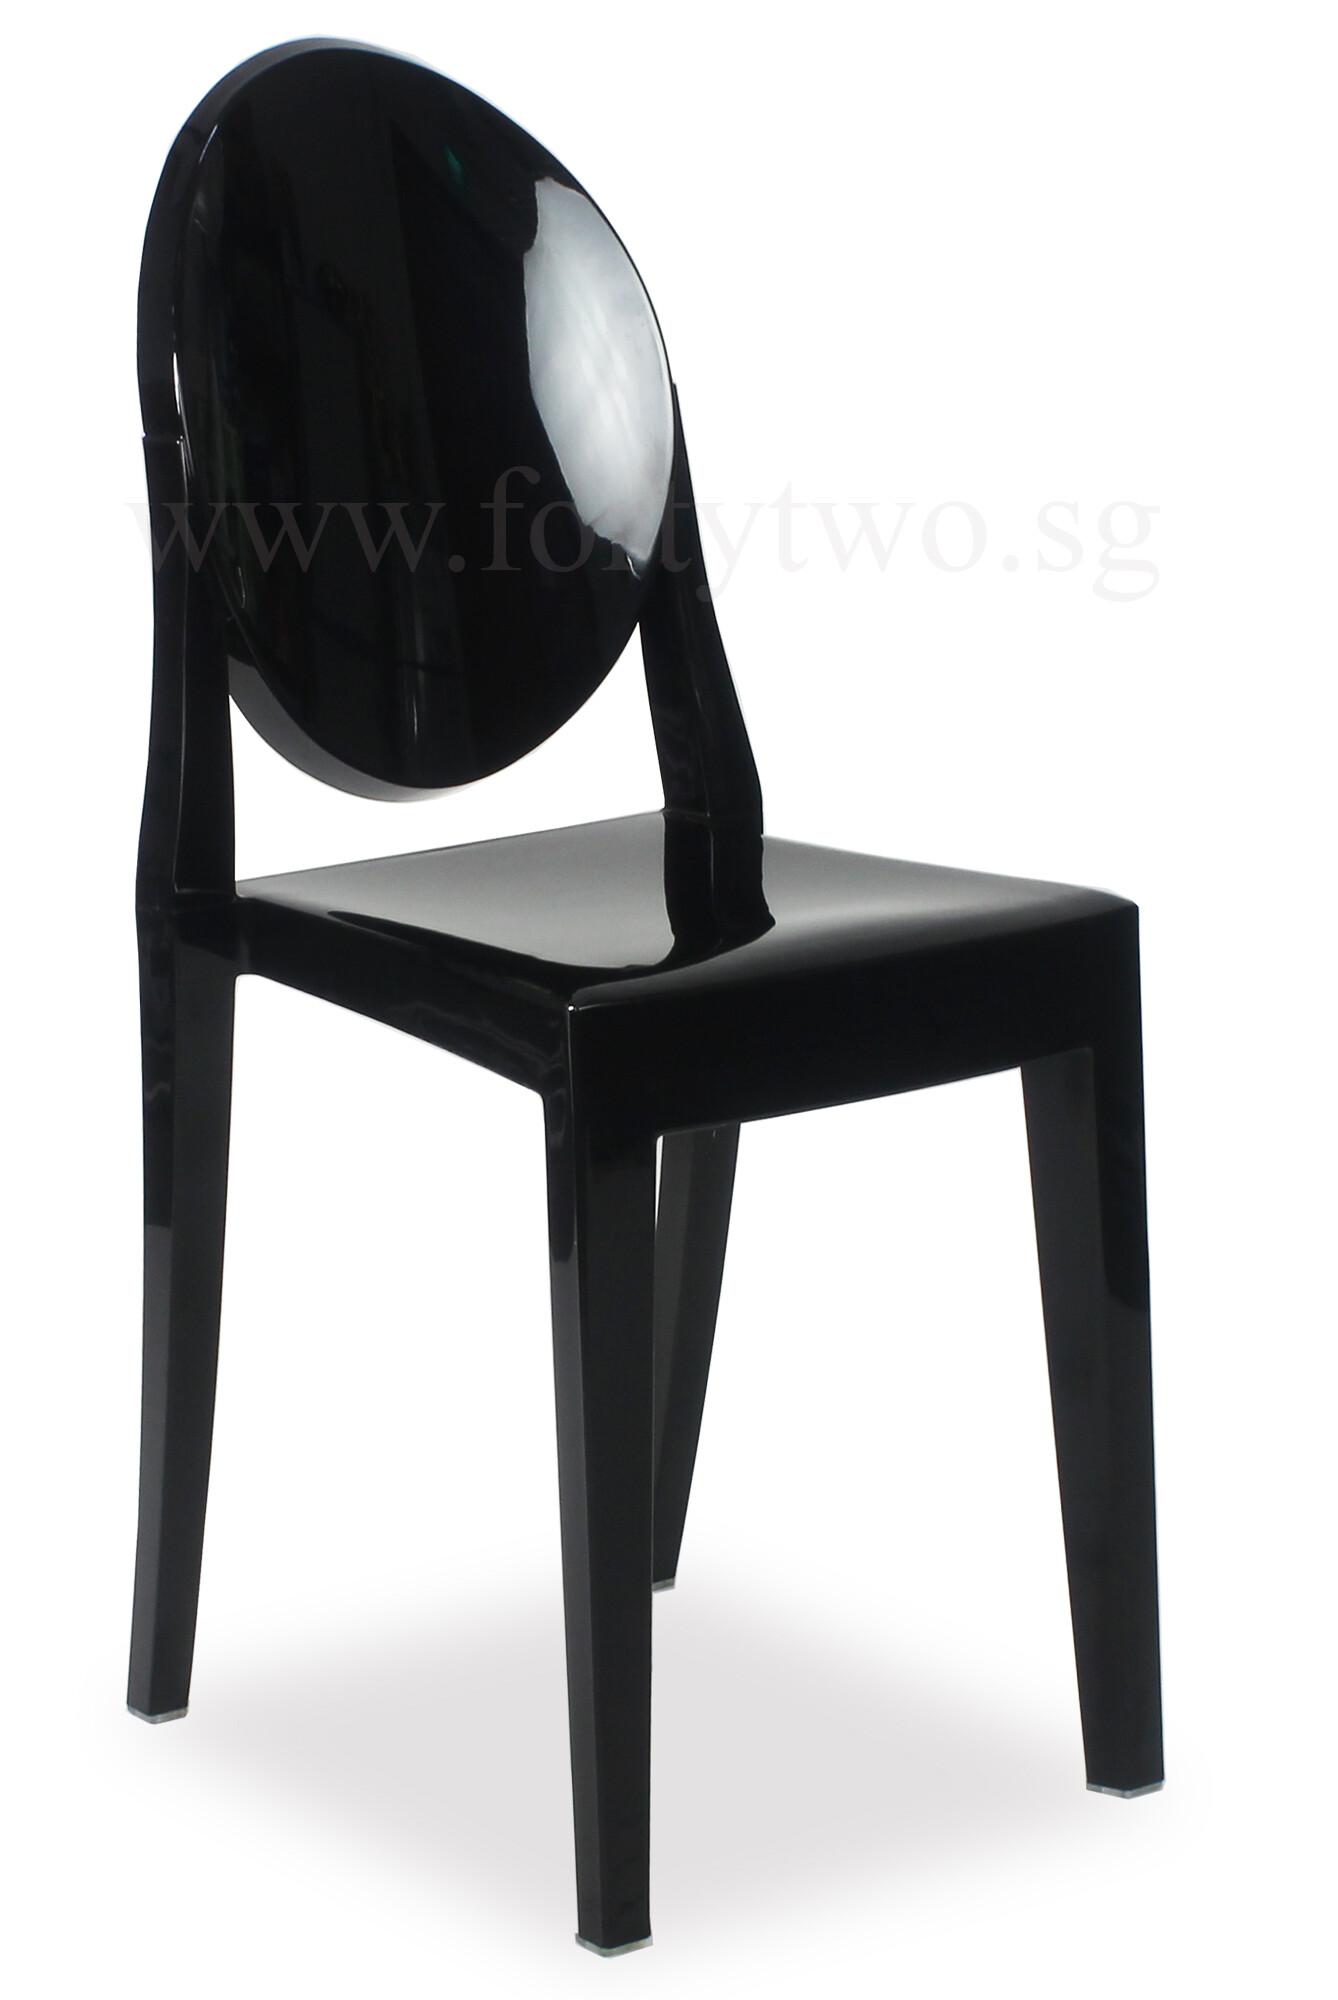 ghost chair replica large slipcover designer louis black furniture home decor